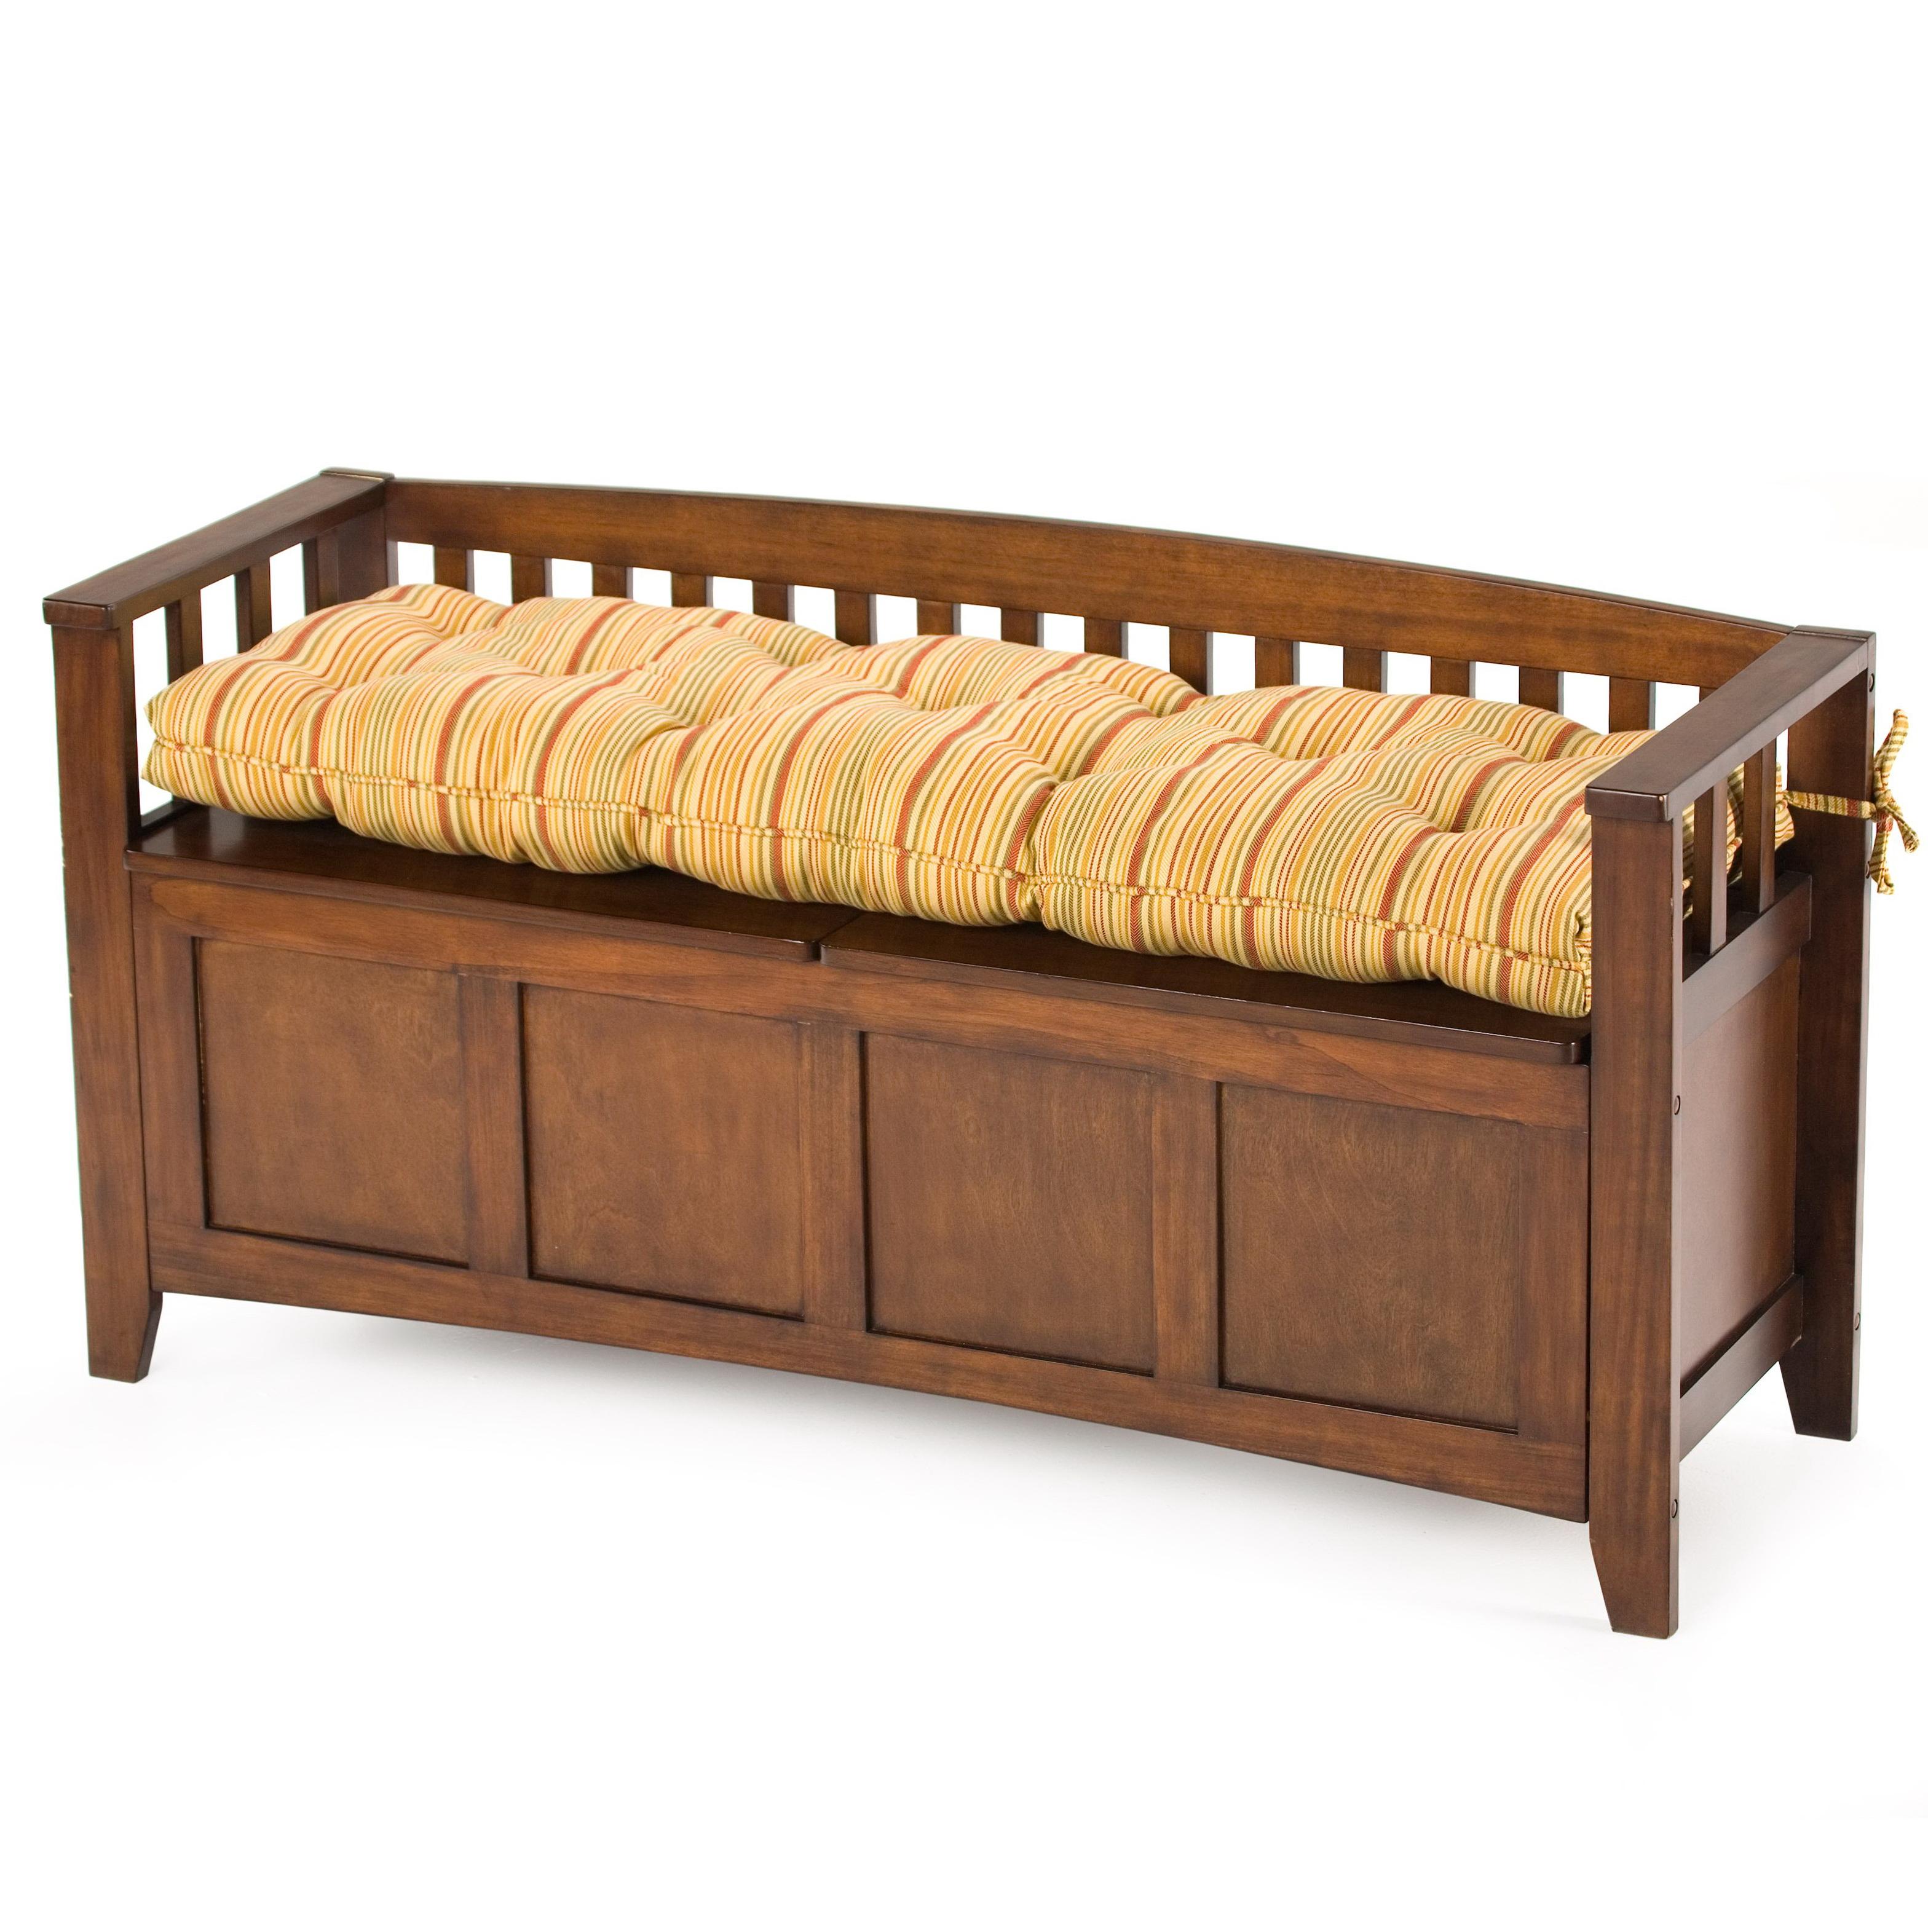 36 Inch Bench Cushion Indoor Home Design Ideas